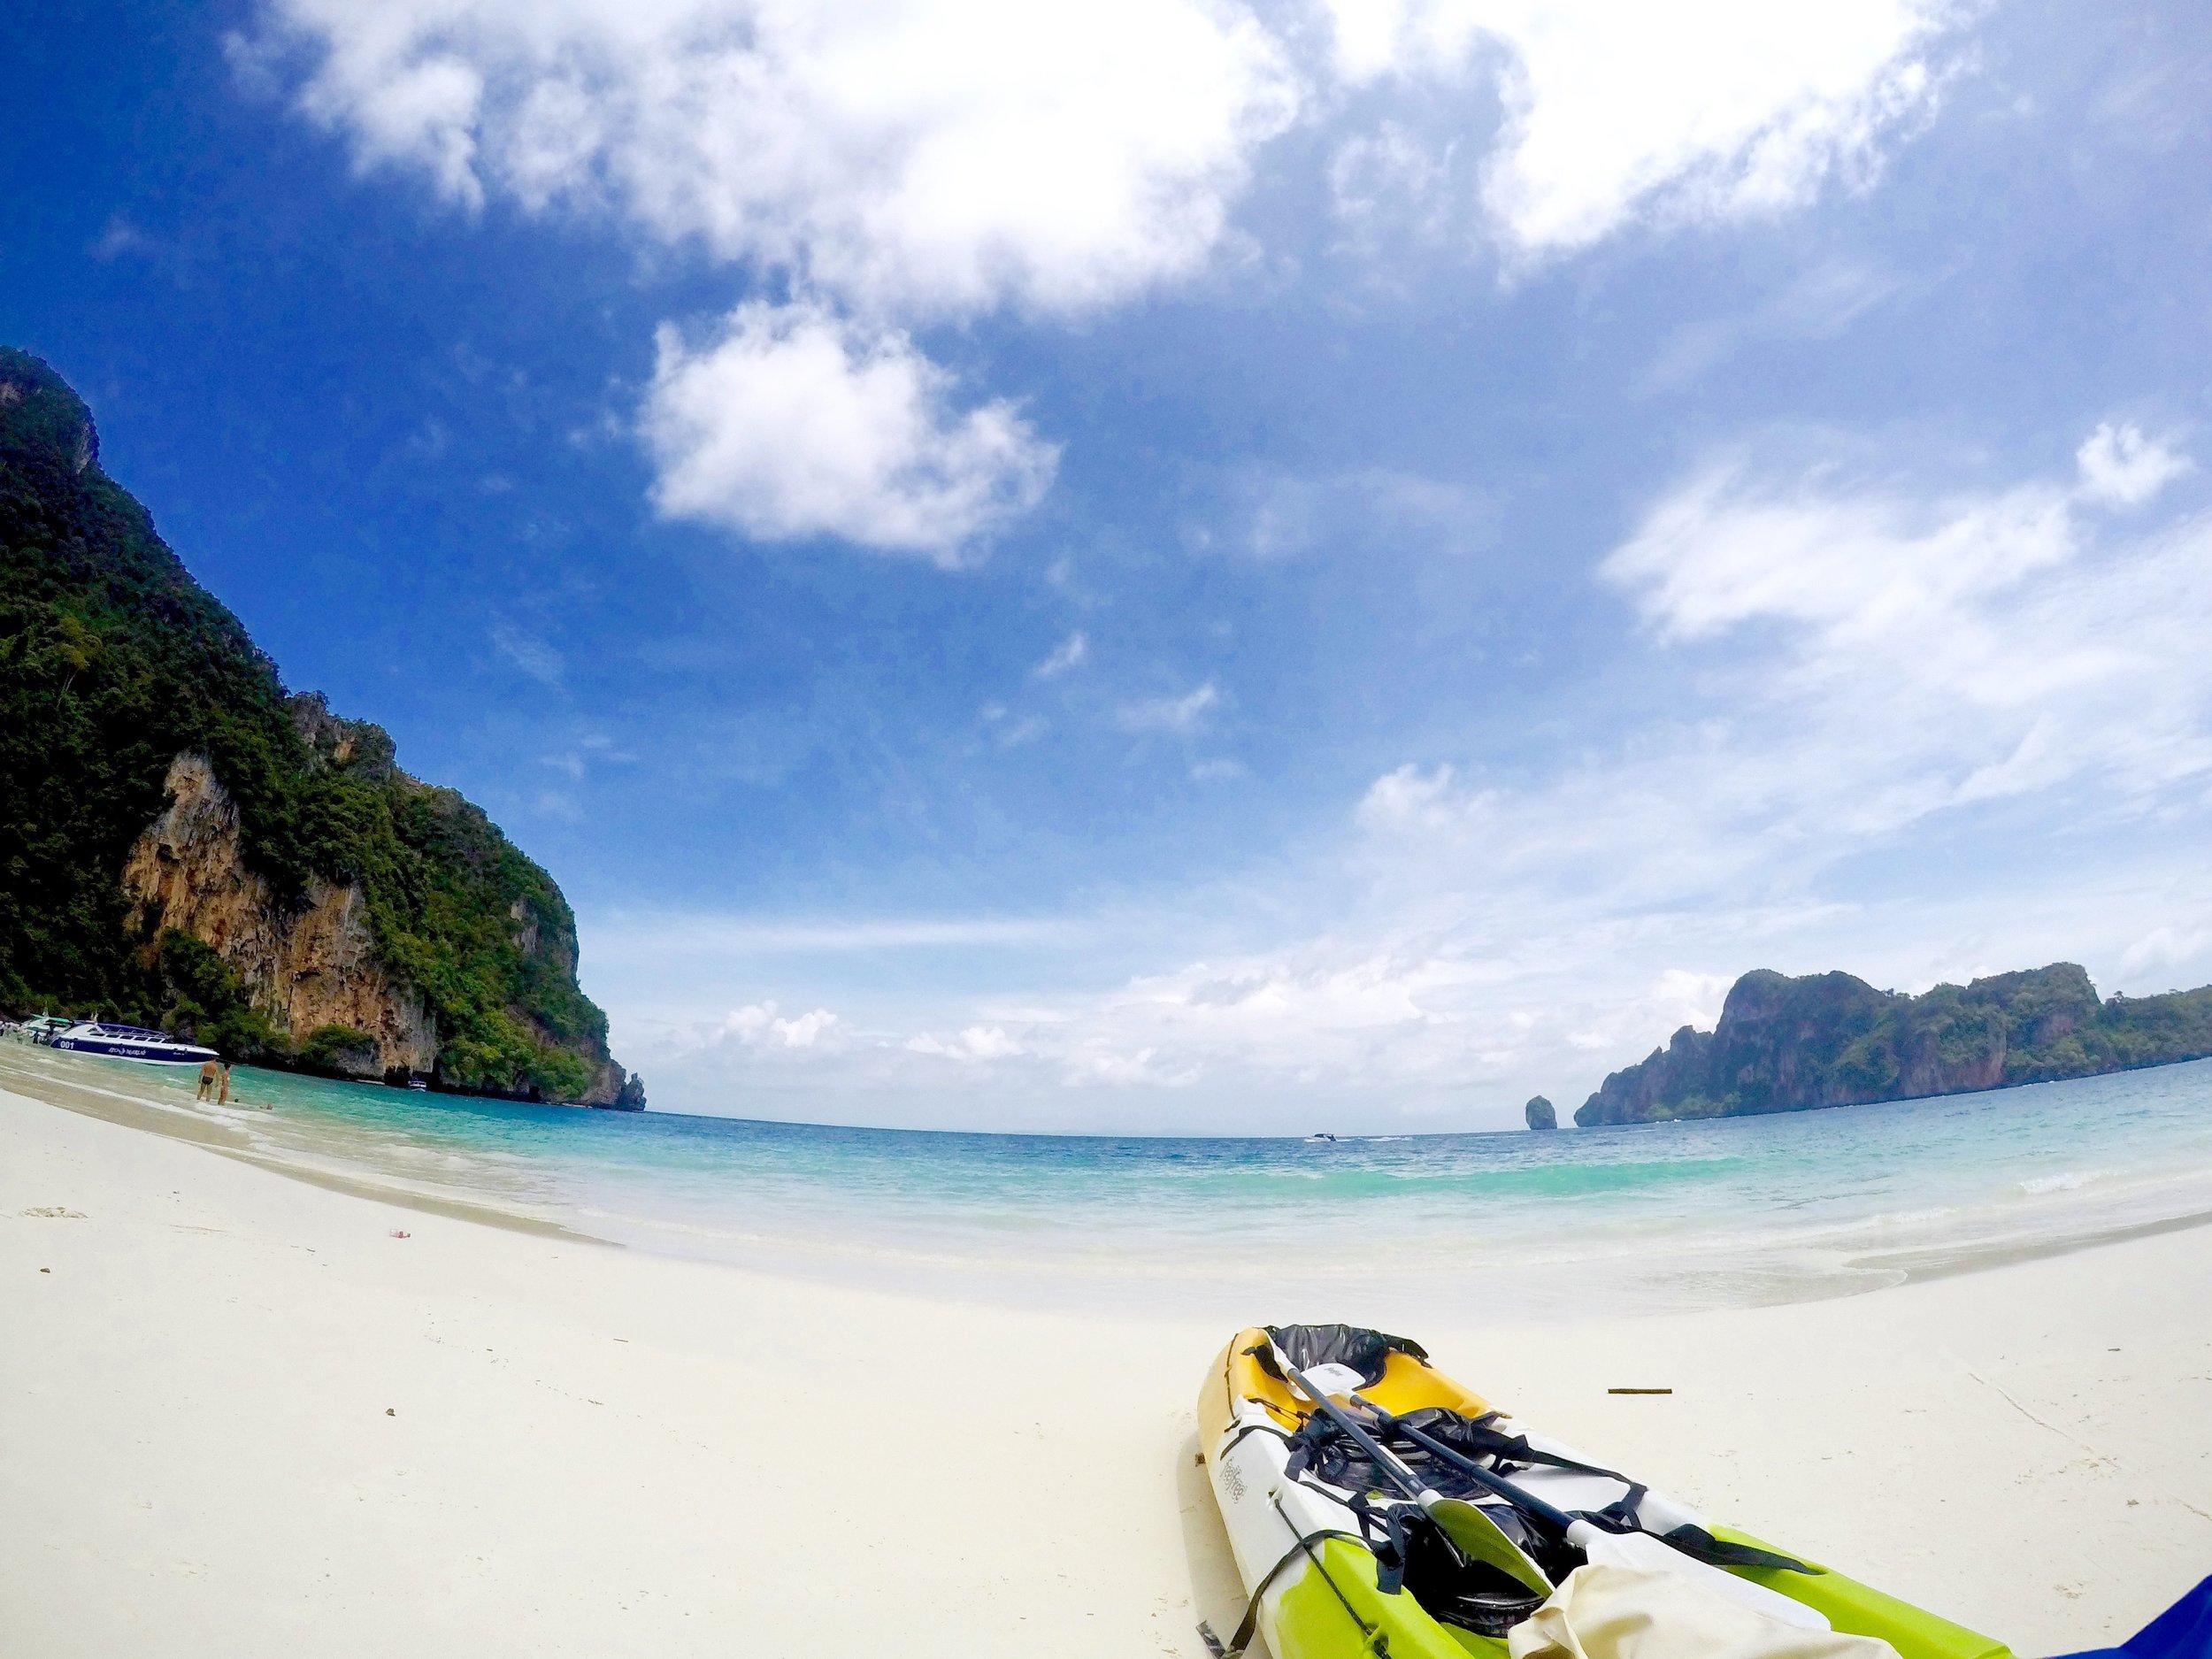 Photo 6 - Thailand.jpg